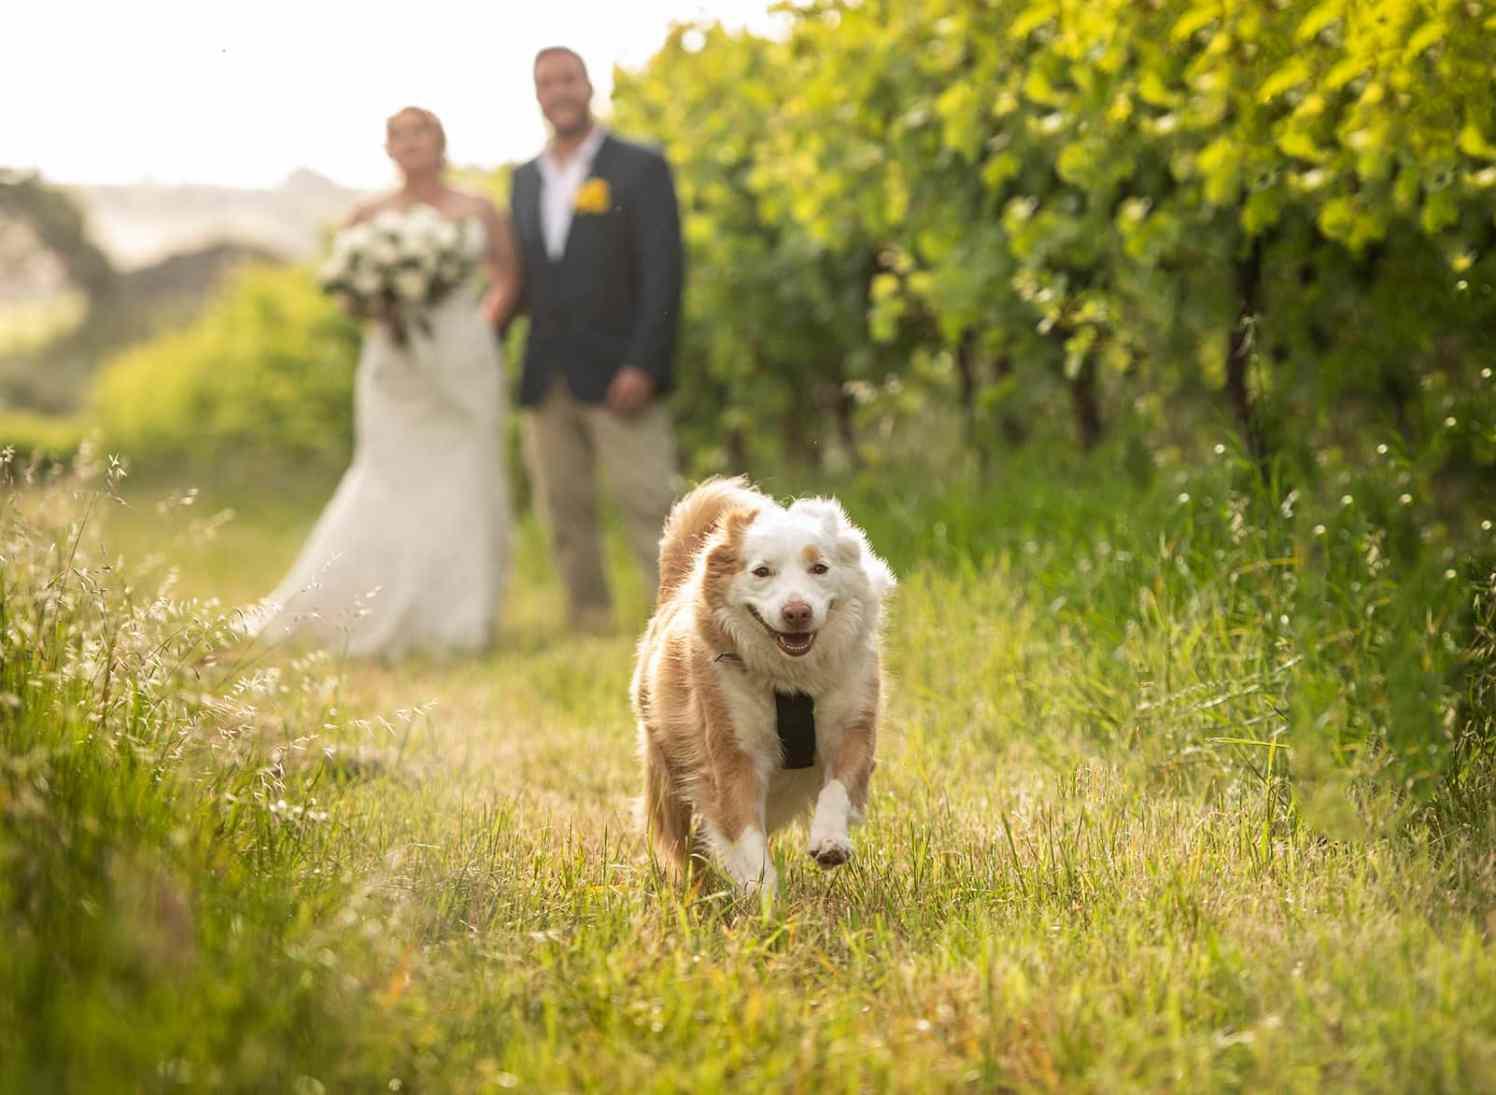 Dog running through vines on wedding day